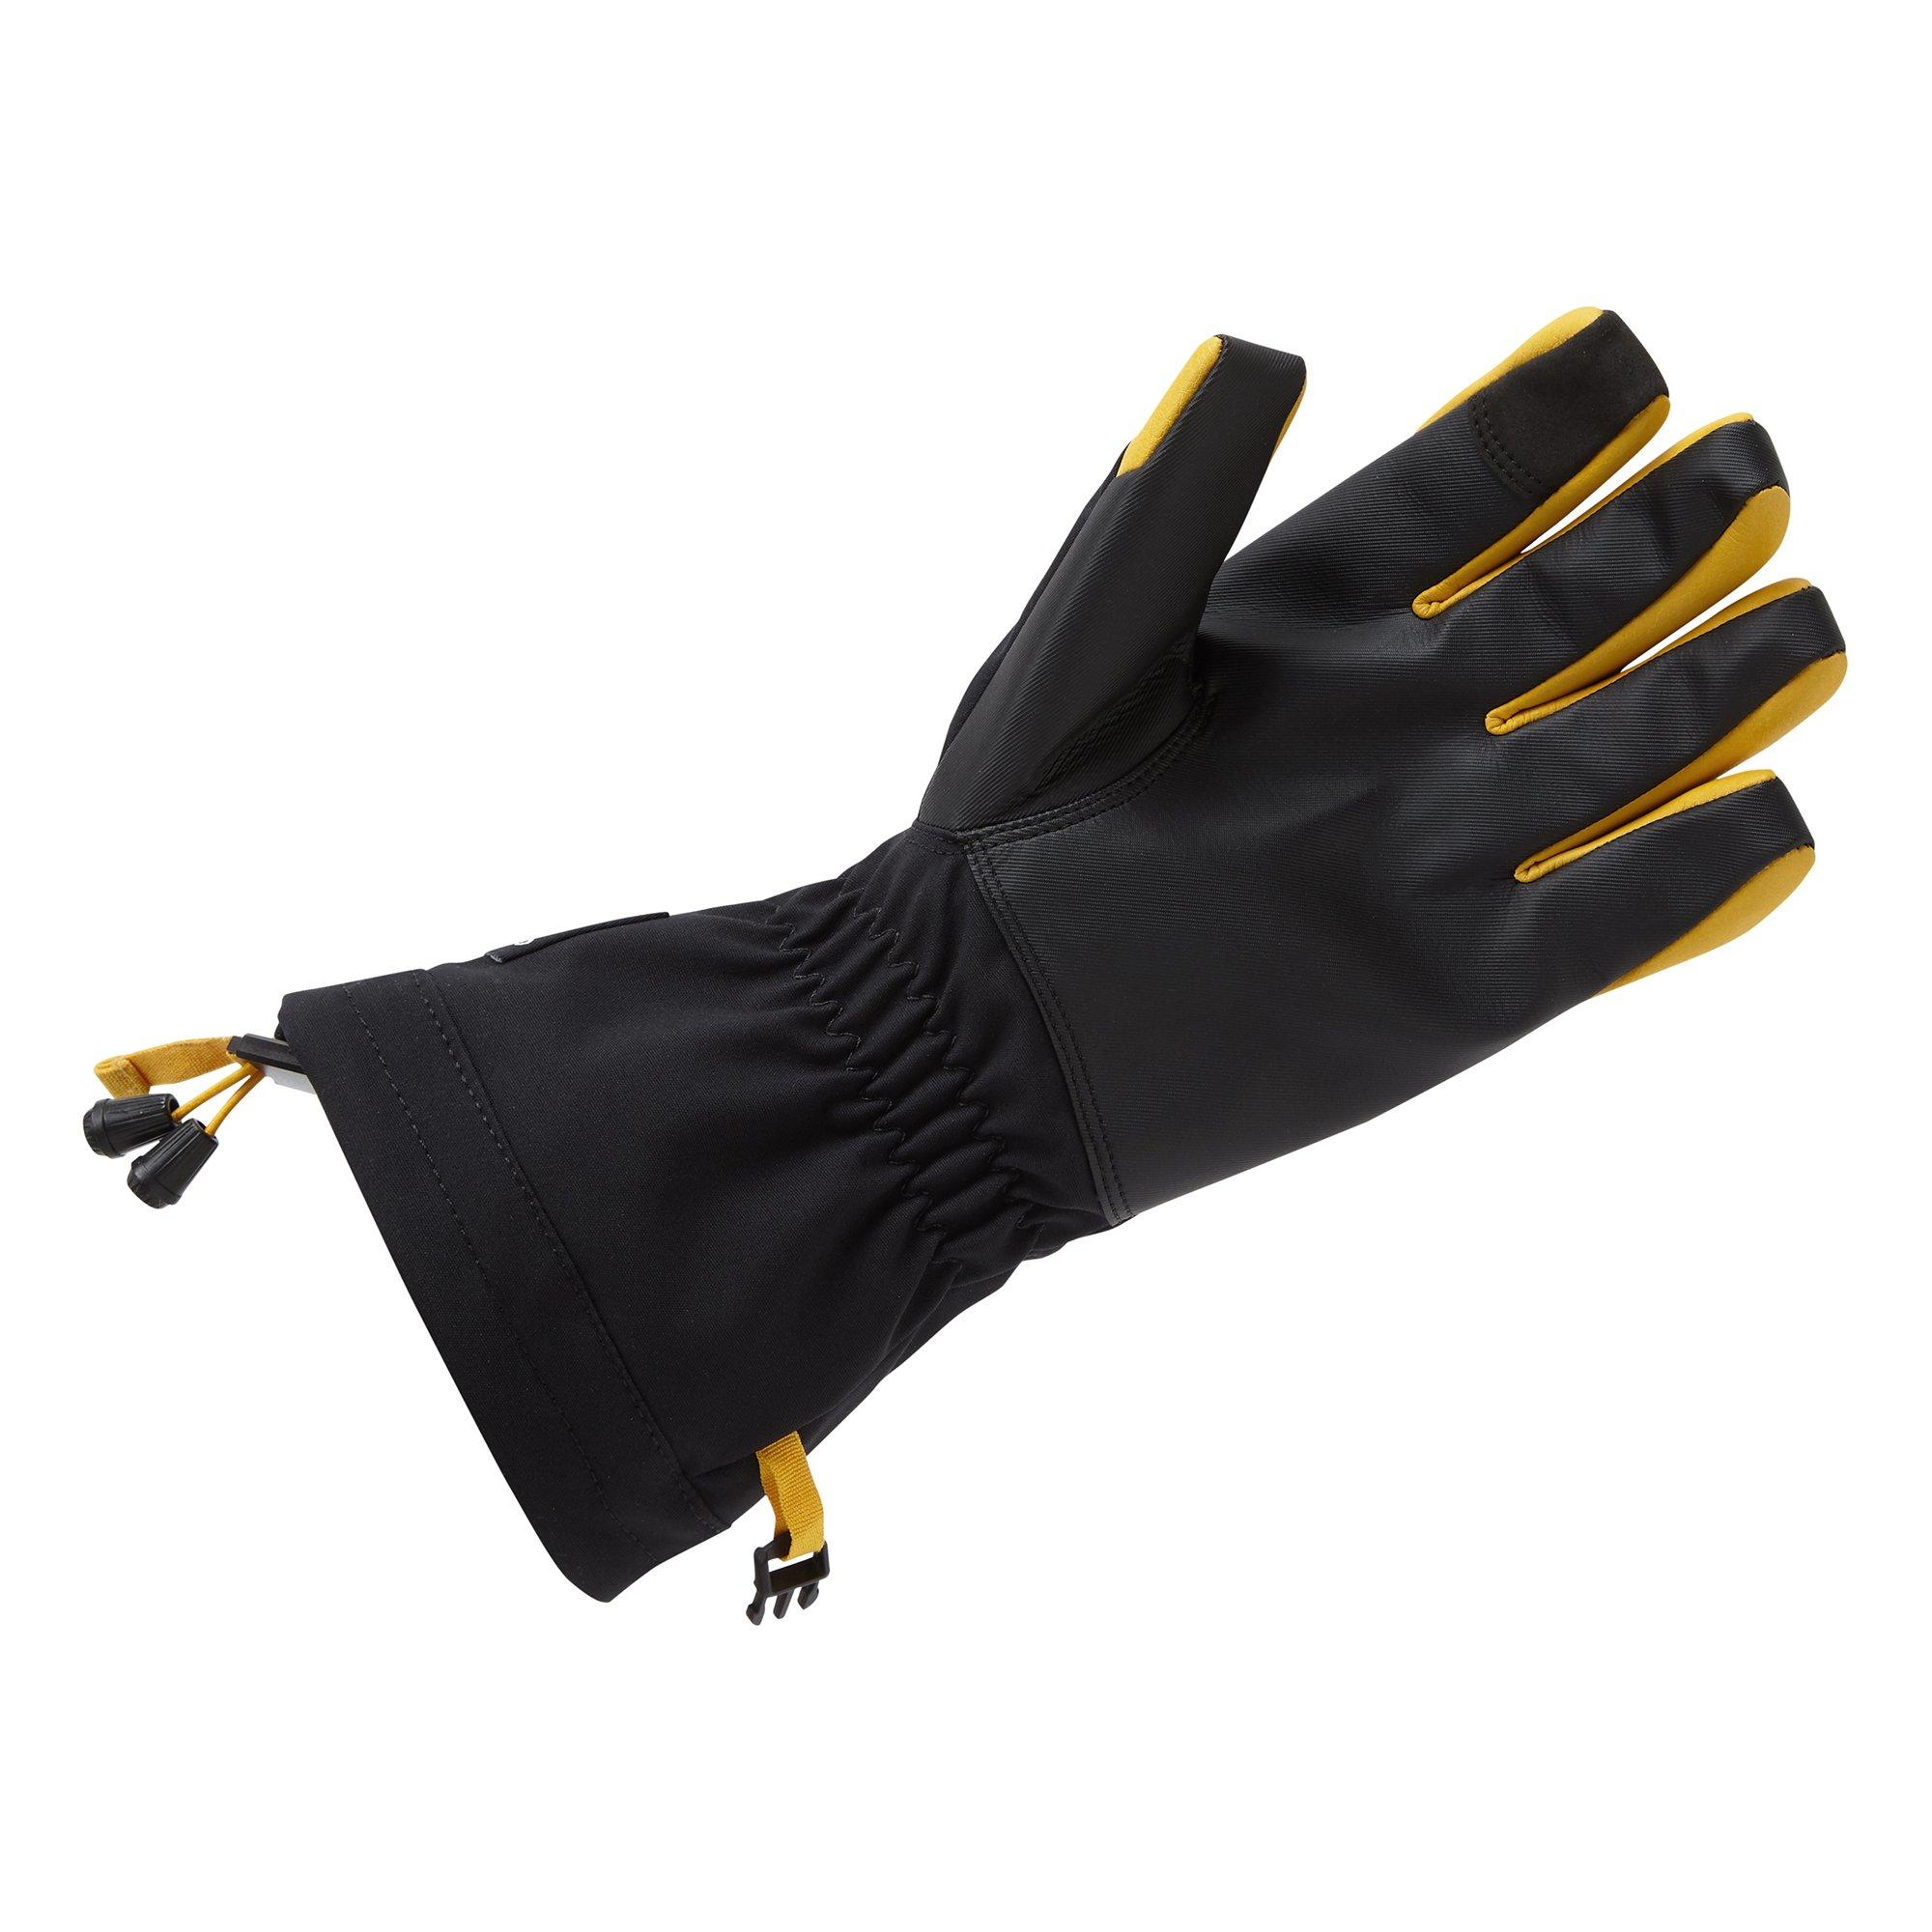 Helmsman-Handschuhe - 7805-BLK01_2.jpg